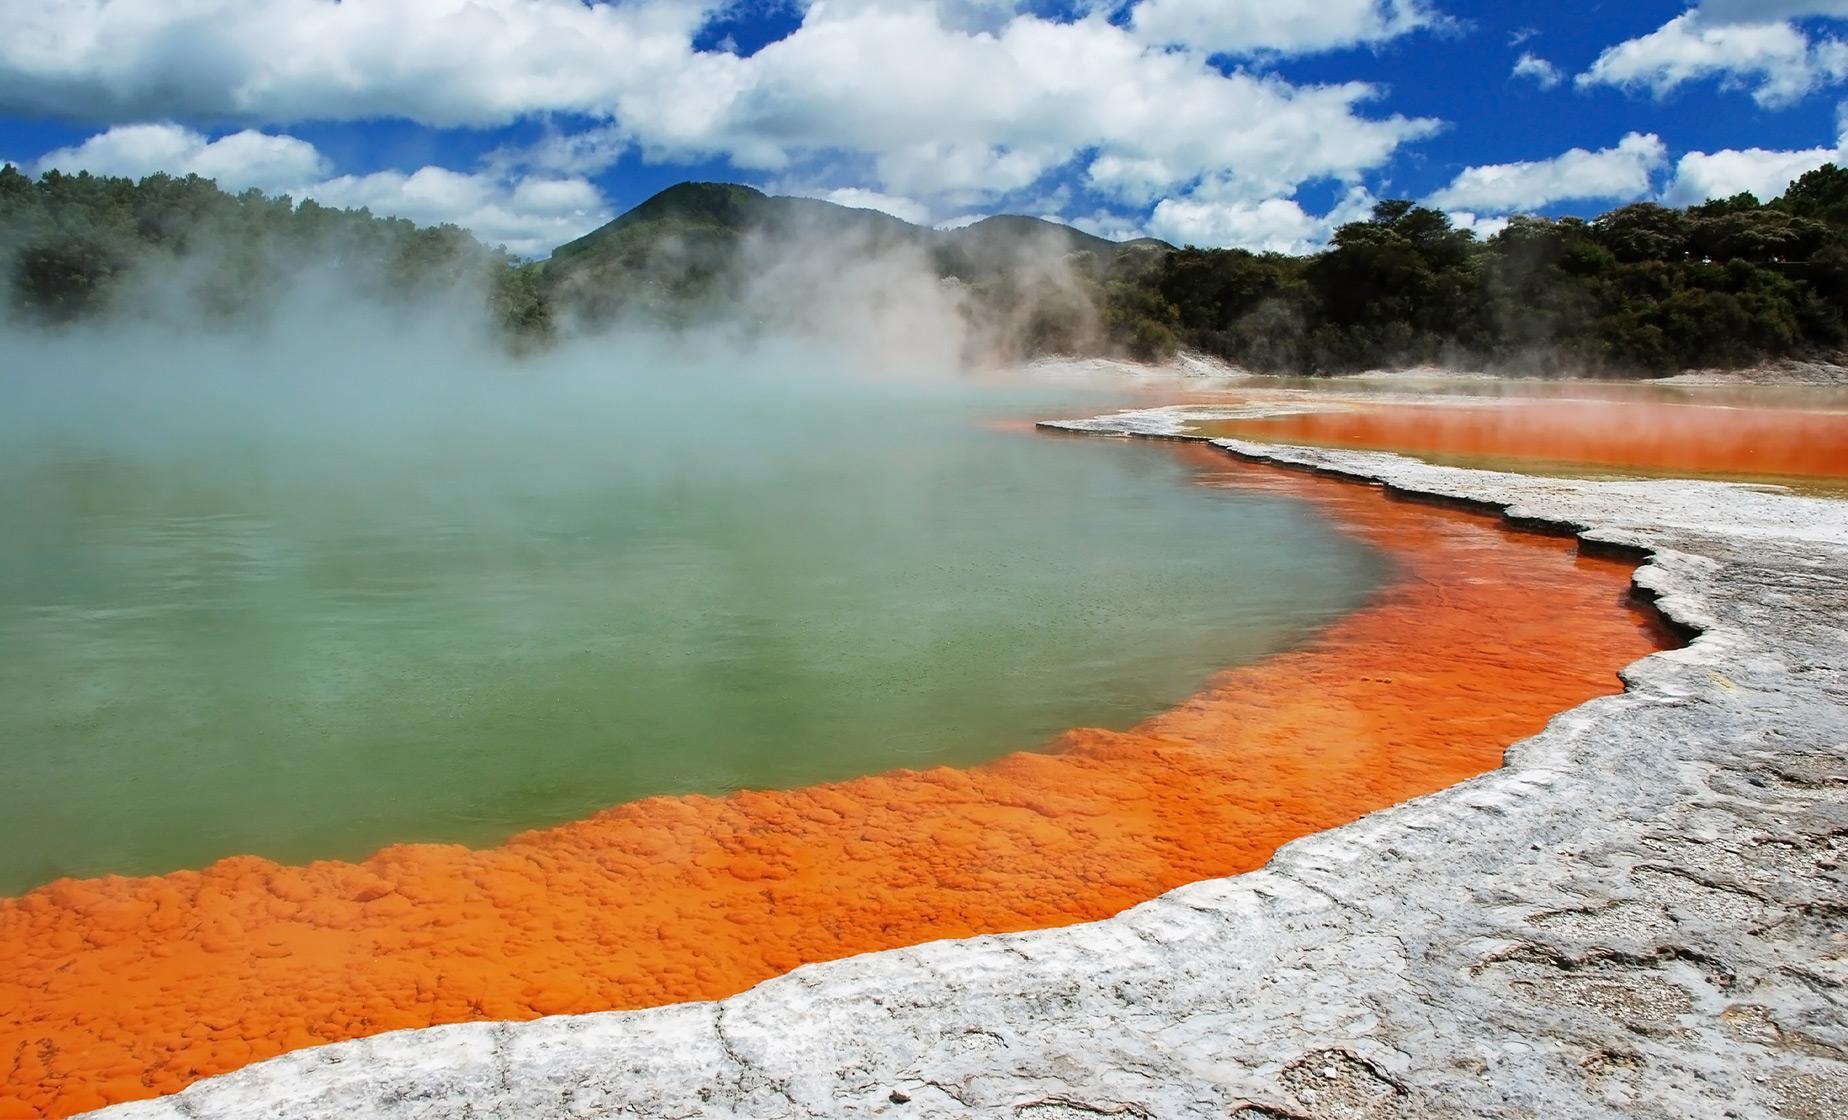 Rotorua Geothermal Wonderland & Maori Cultural Excursion